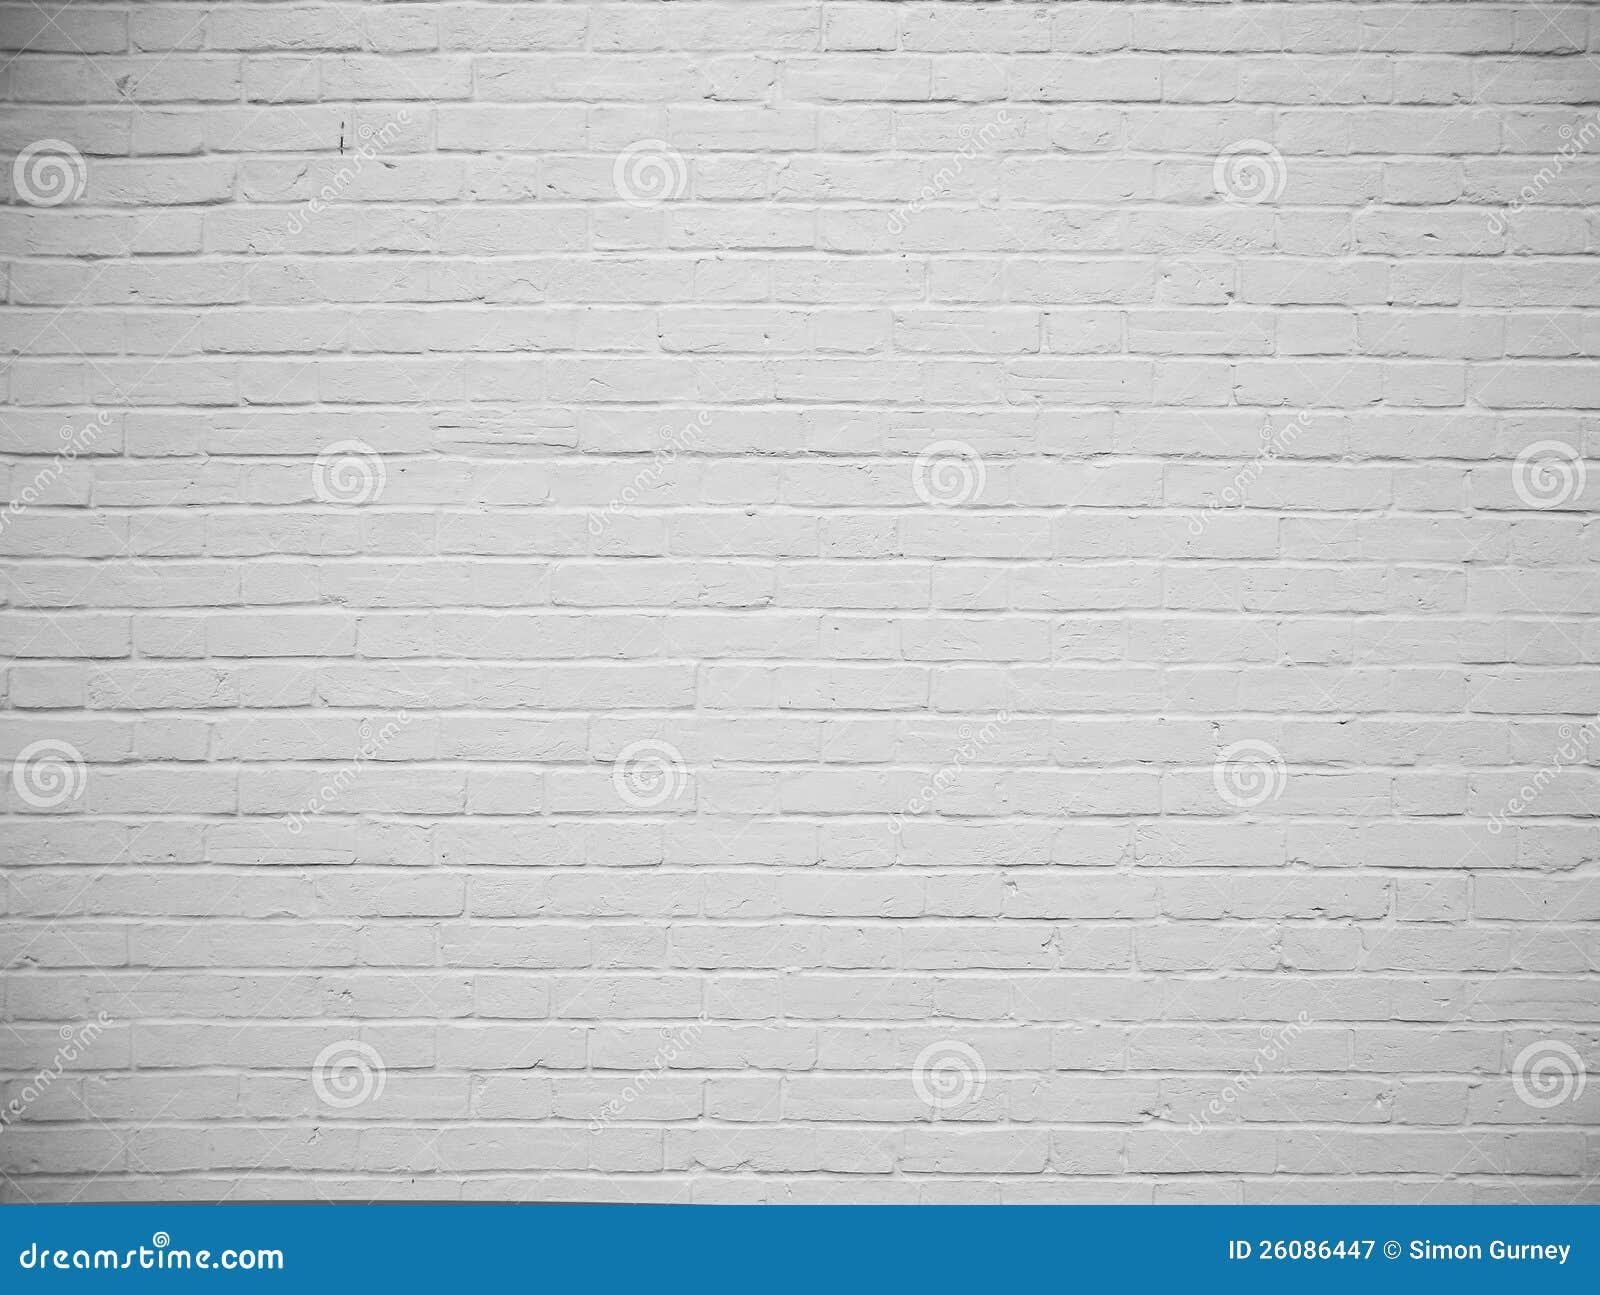 Fondo pintado blanco en blanco de la pared de ladrillo